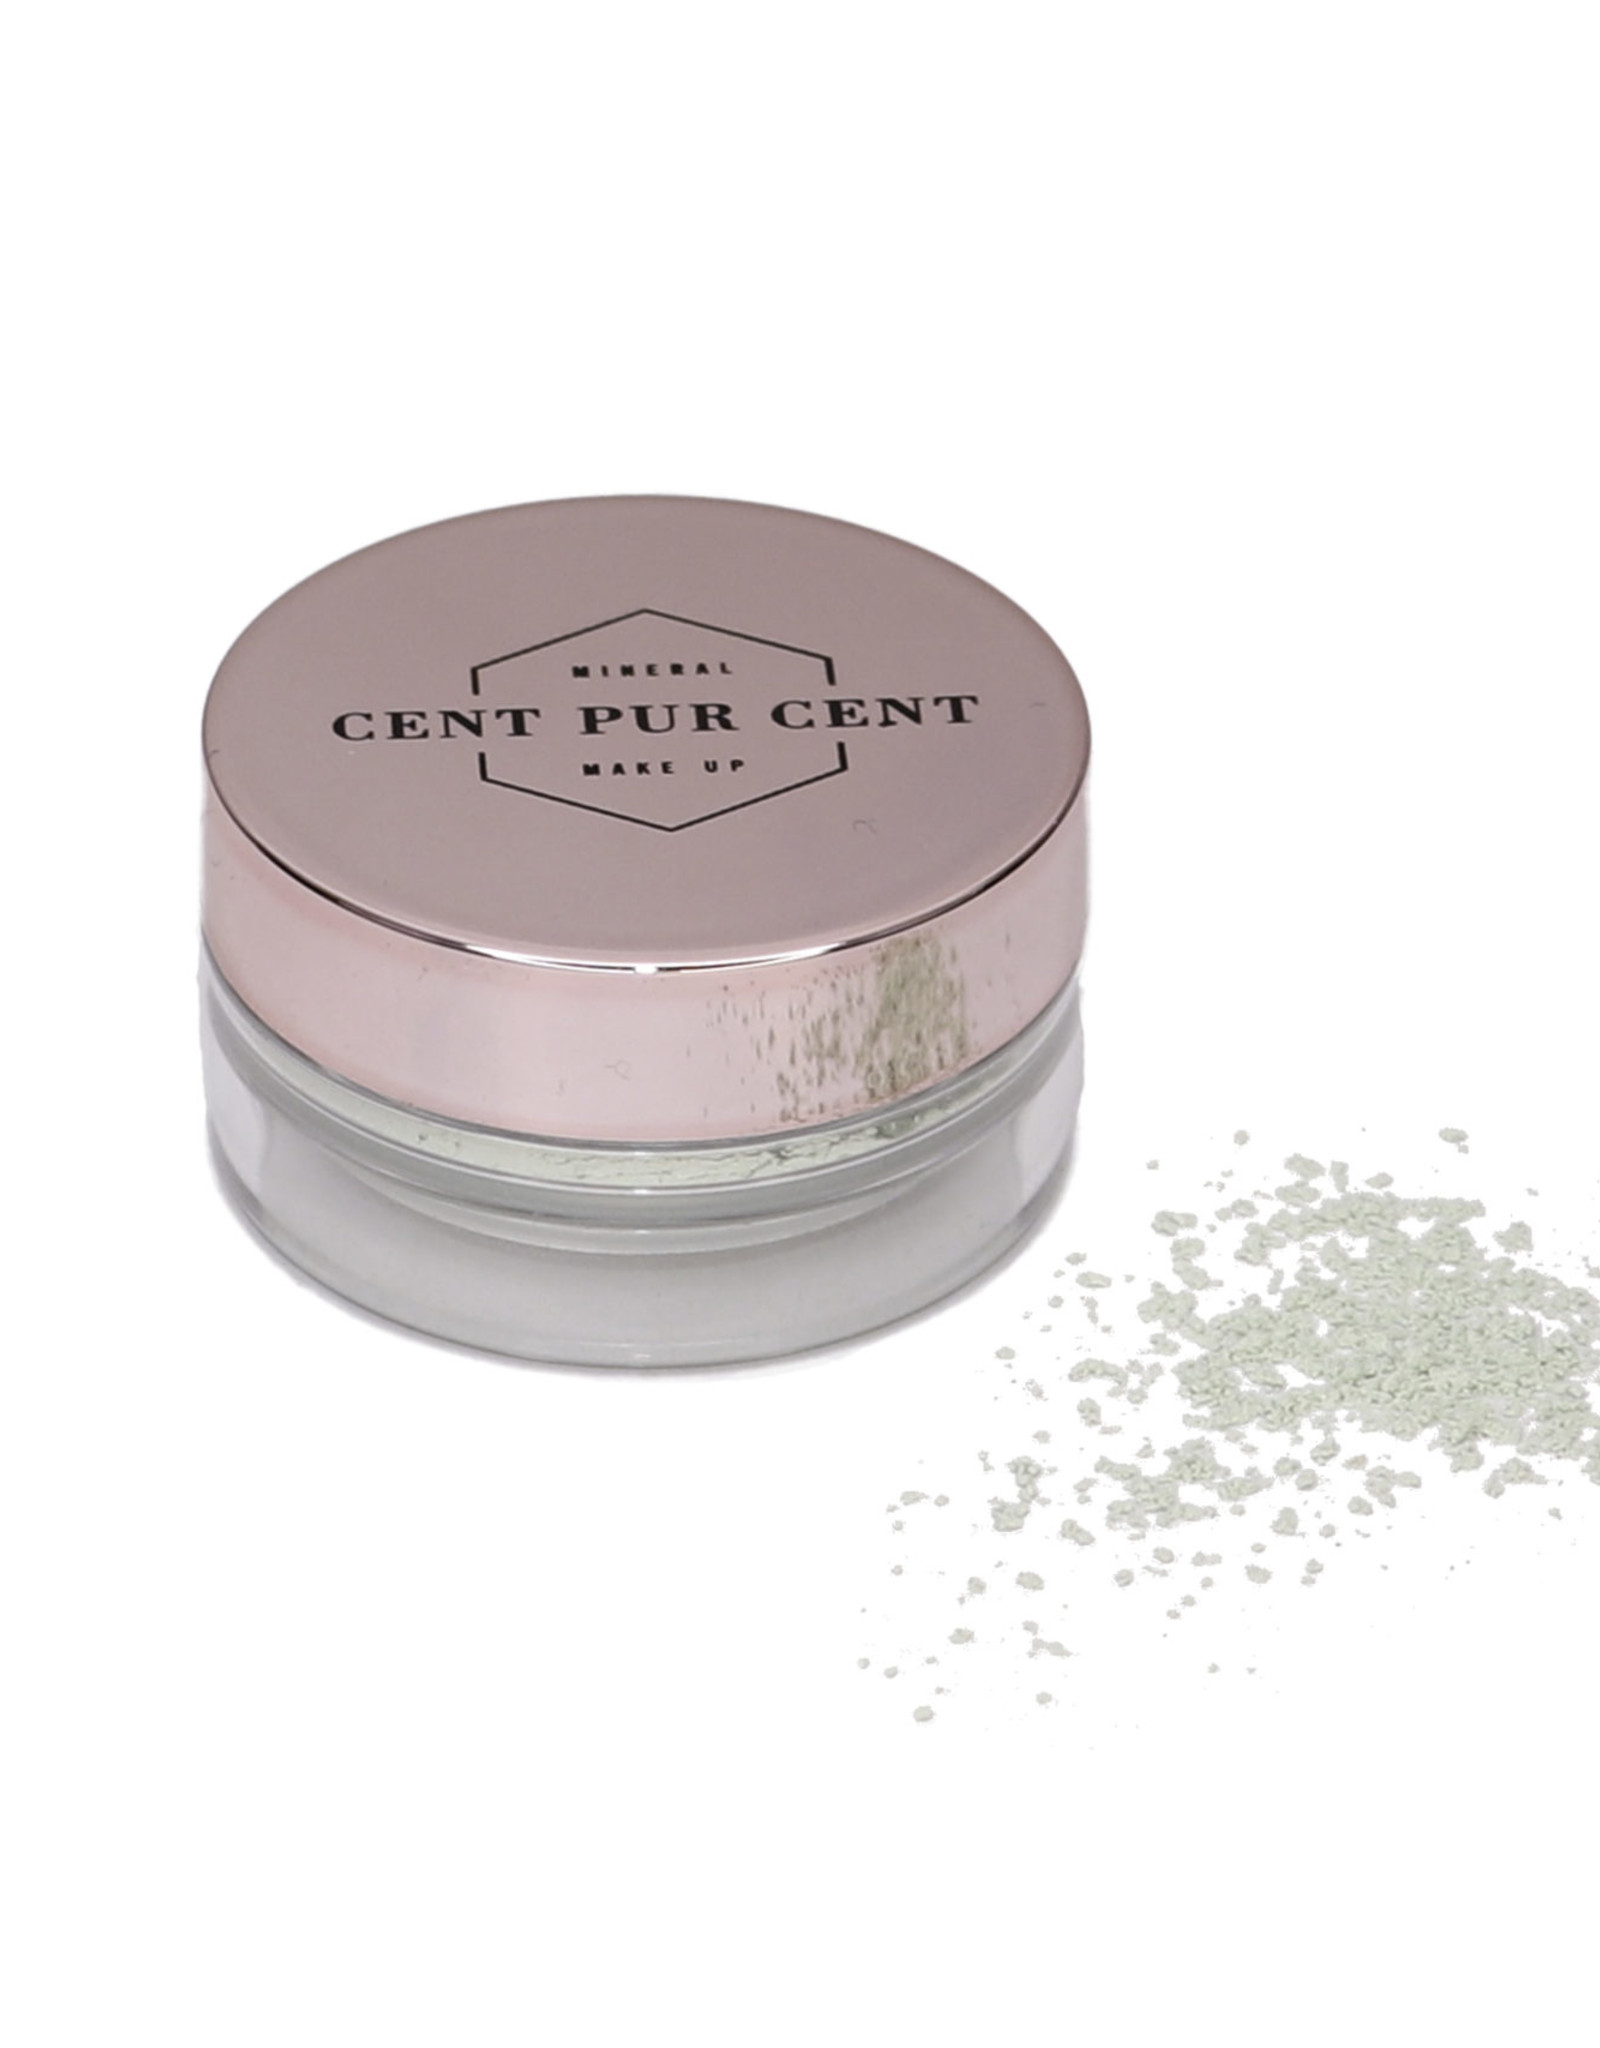 CentpurCent Cent pur Cent - Mineral Loose Concealer Groen